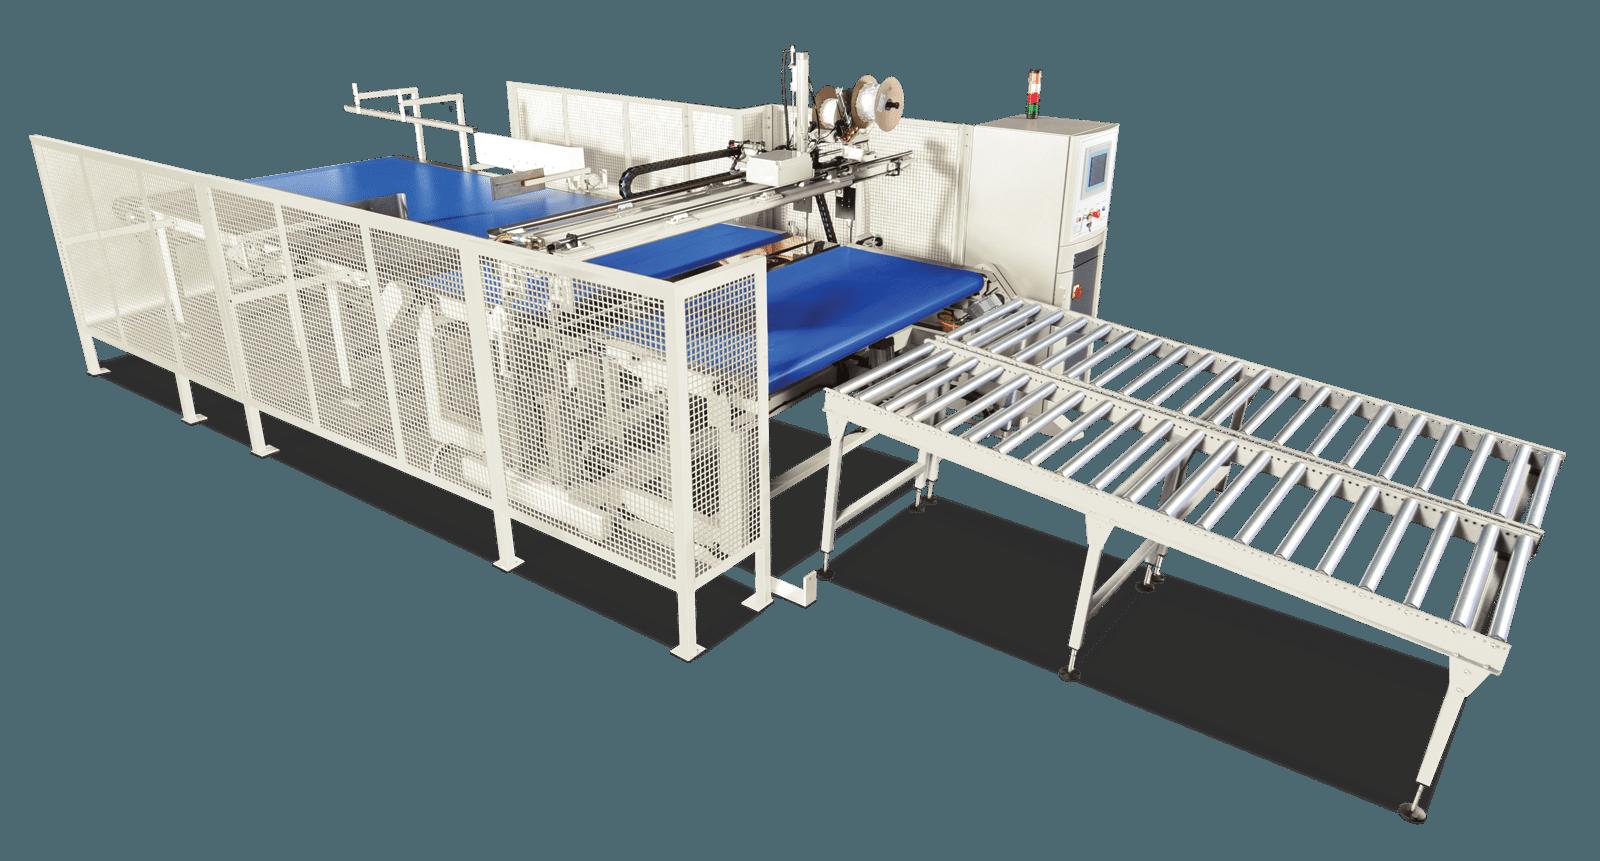 Autotuft Automatic mattress tufting system